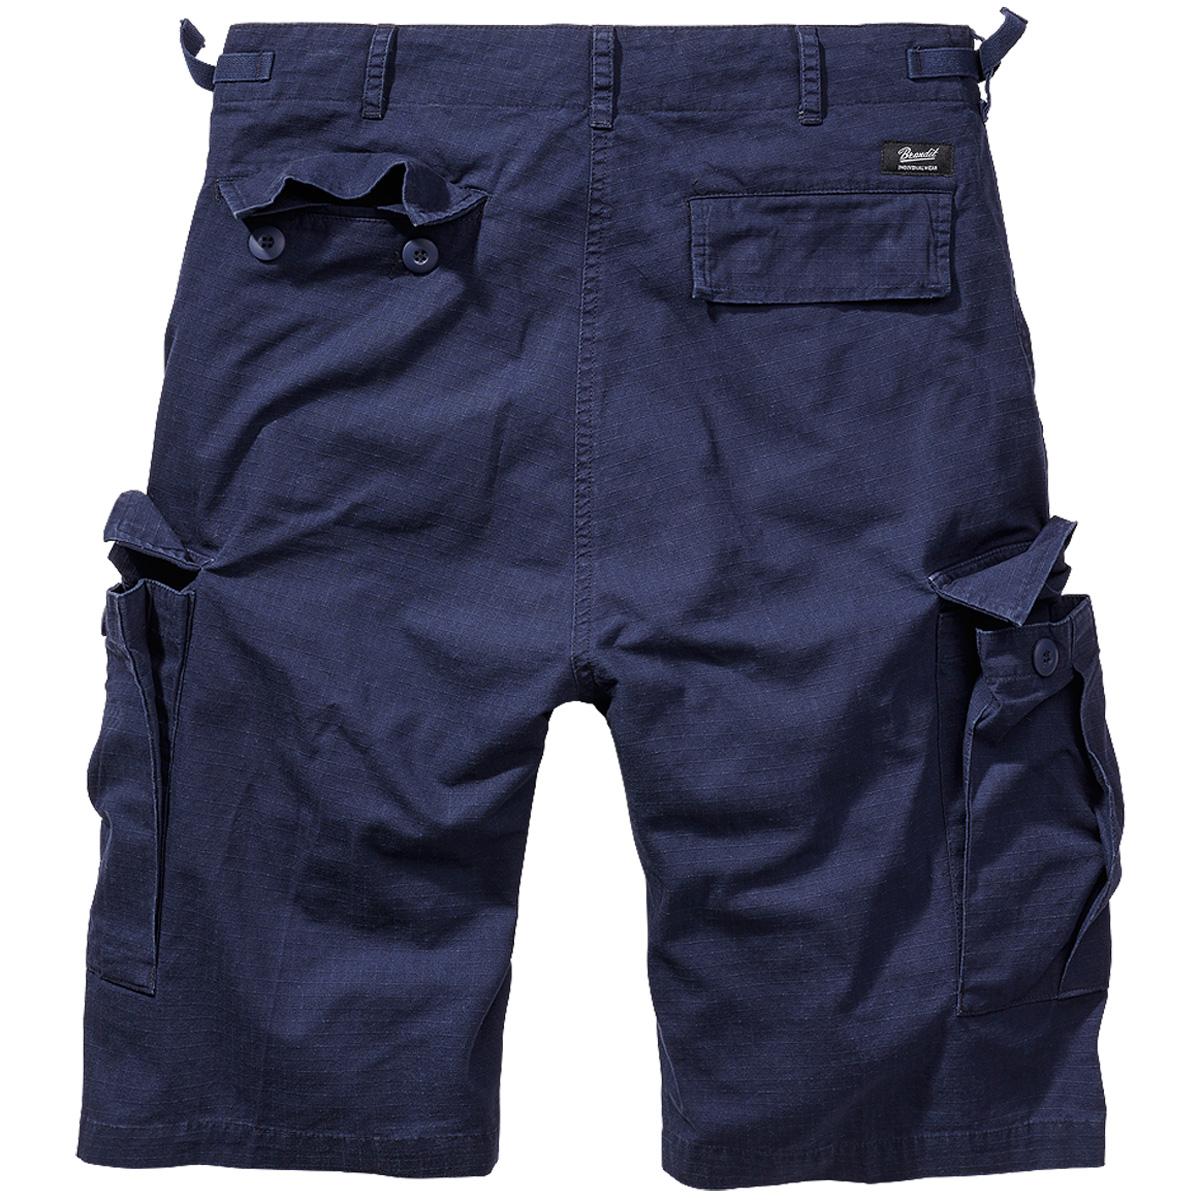 Brandit-BDU-Ripstop-Shorts-S-7XL-Army-Cargo-Bermuda-Outdoor-Short-kurze-Hose miniatura 7